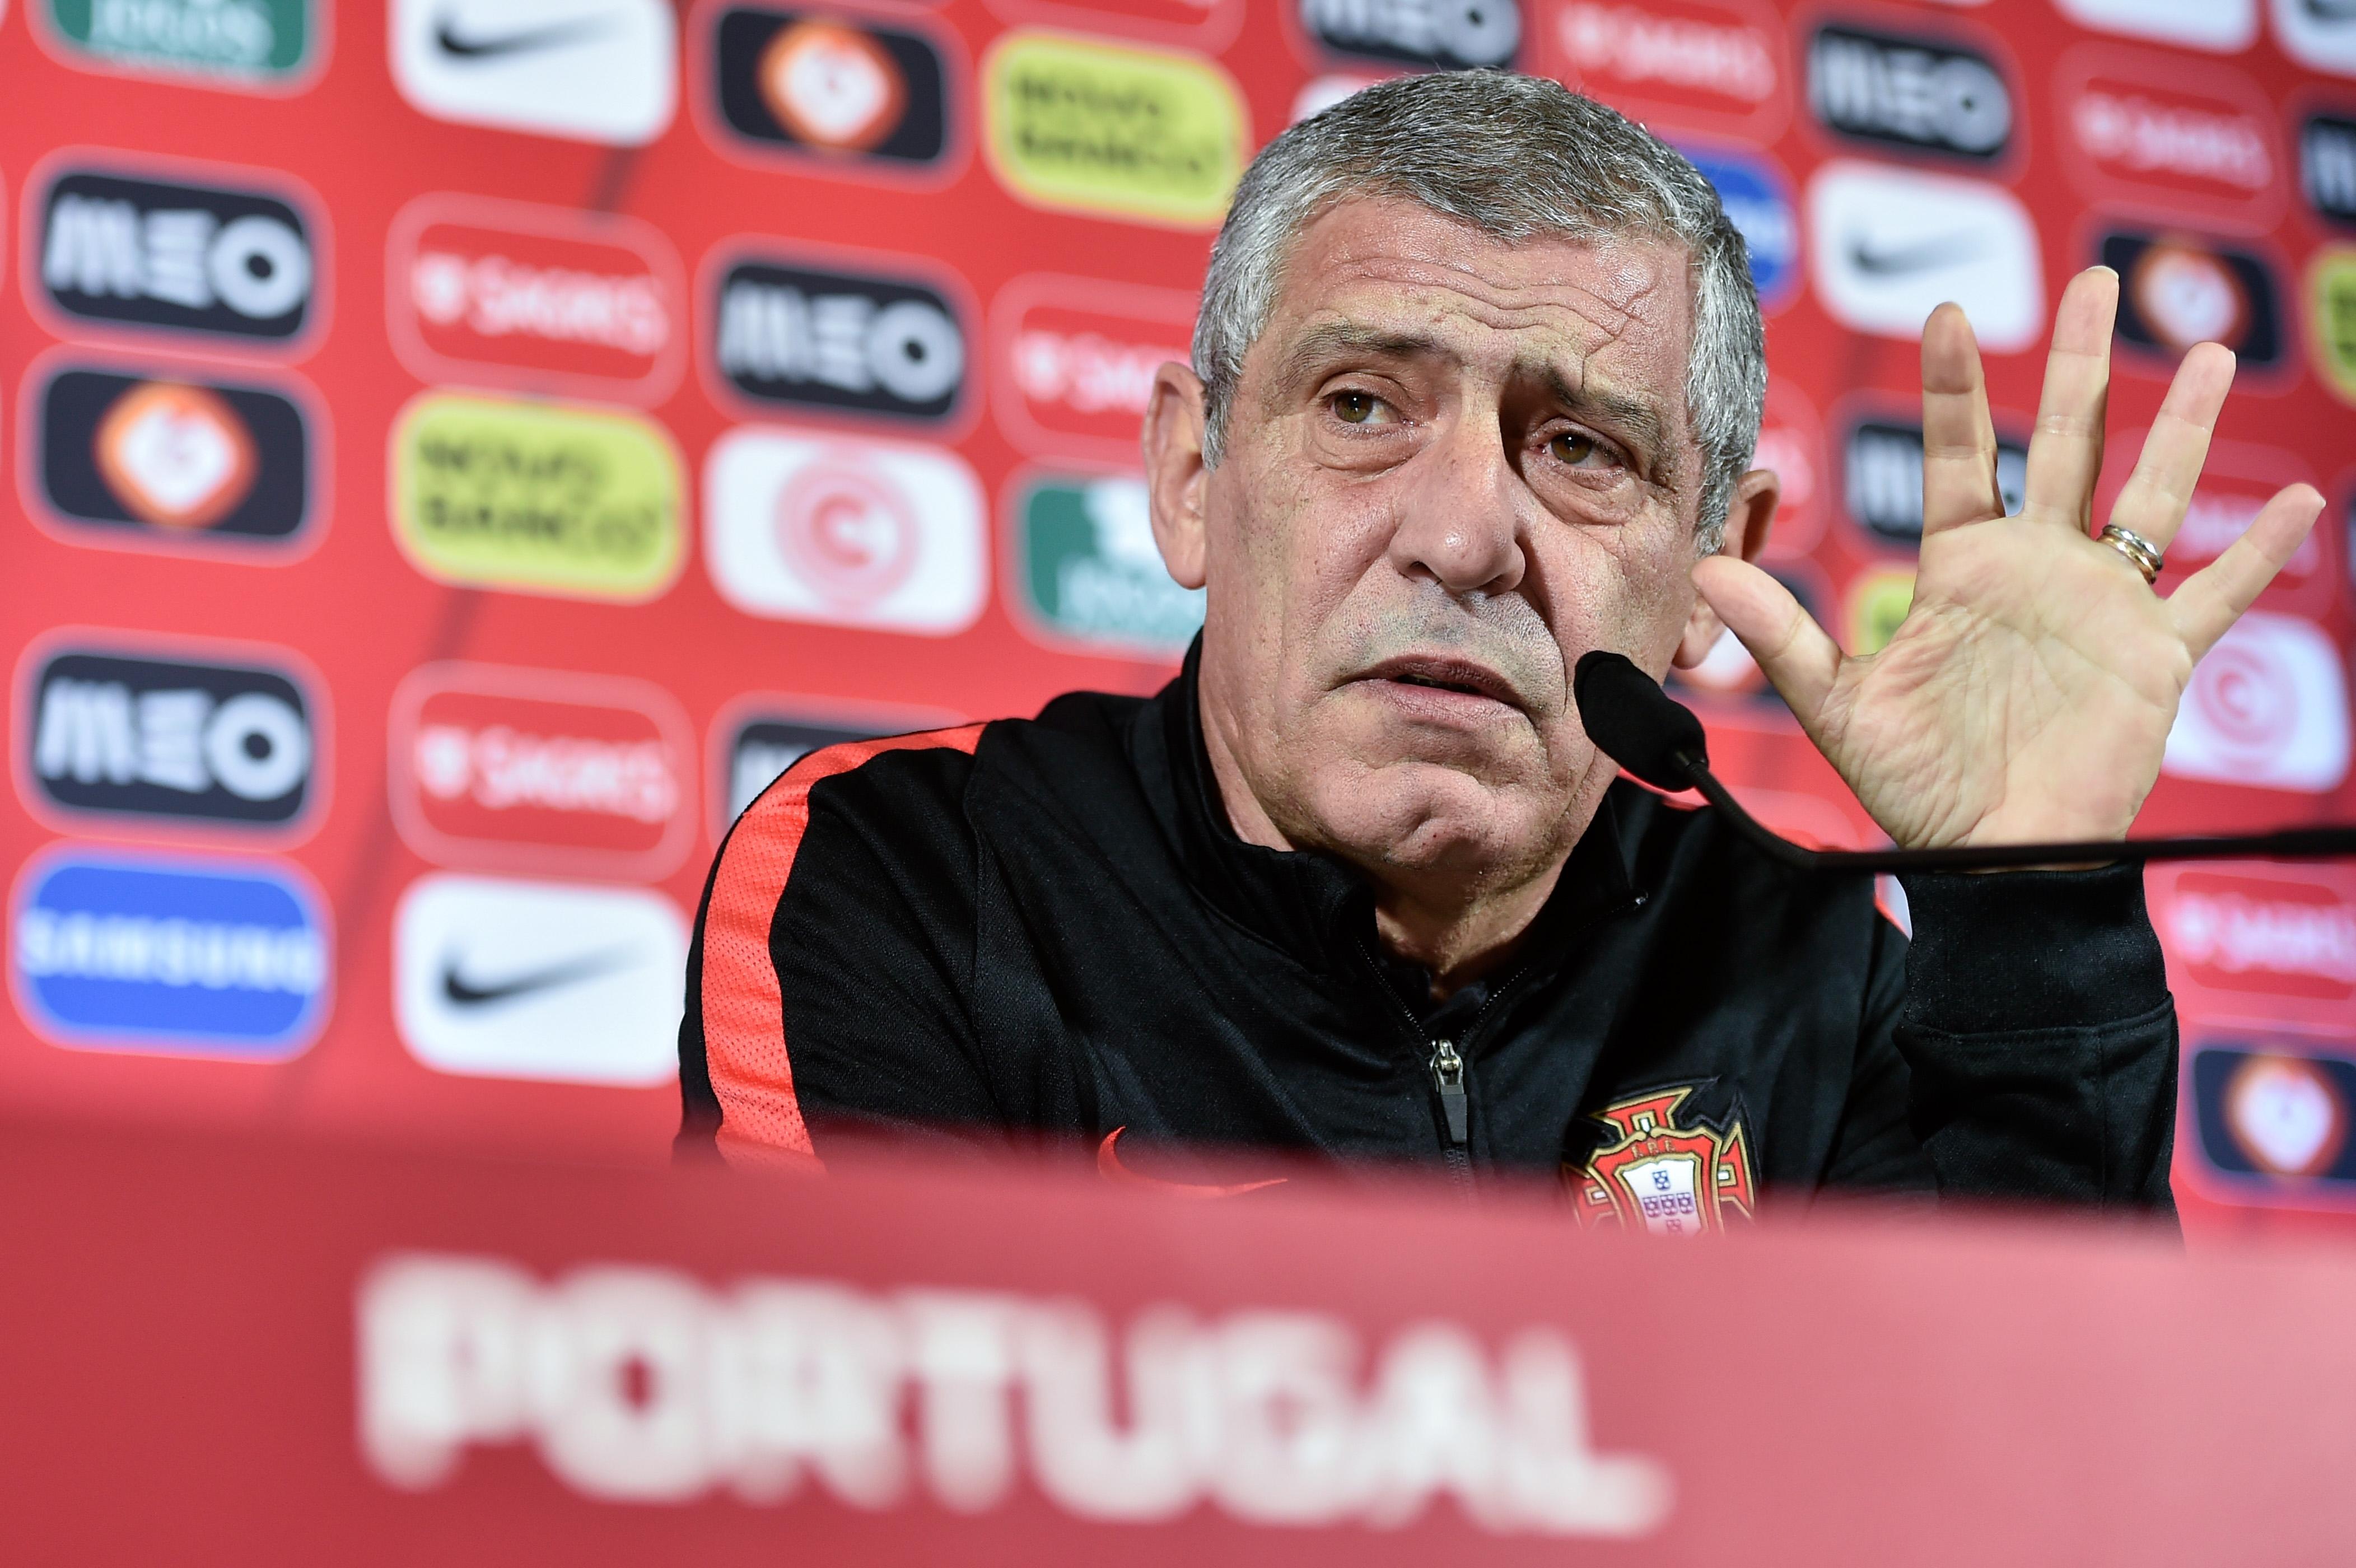 Mundial2018: Portugal - Arábia Saudita (ficha)